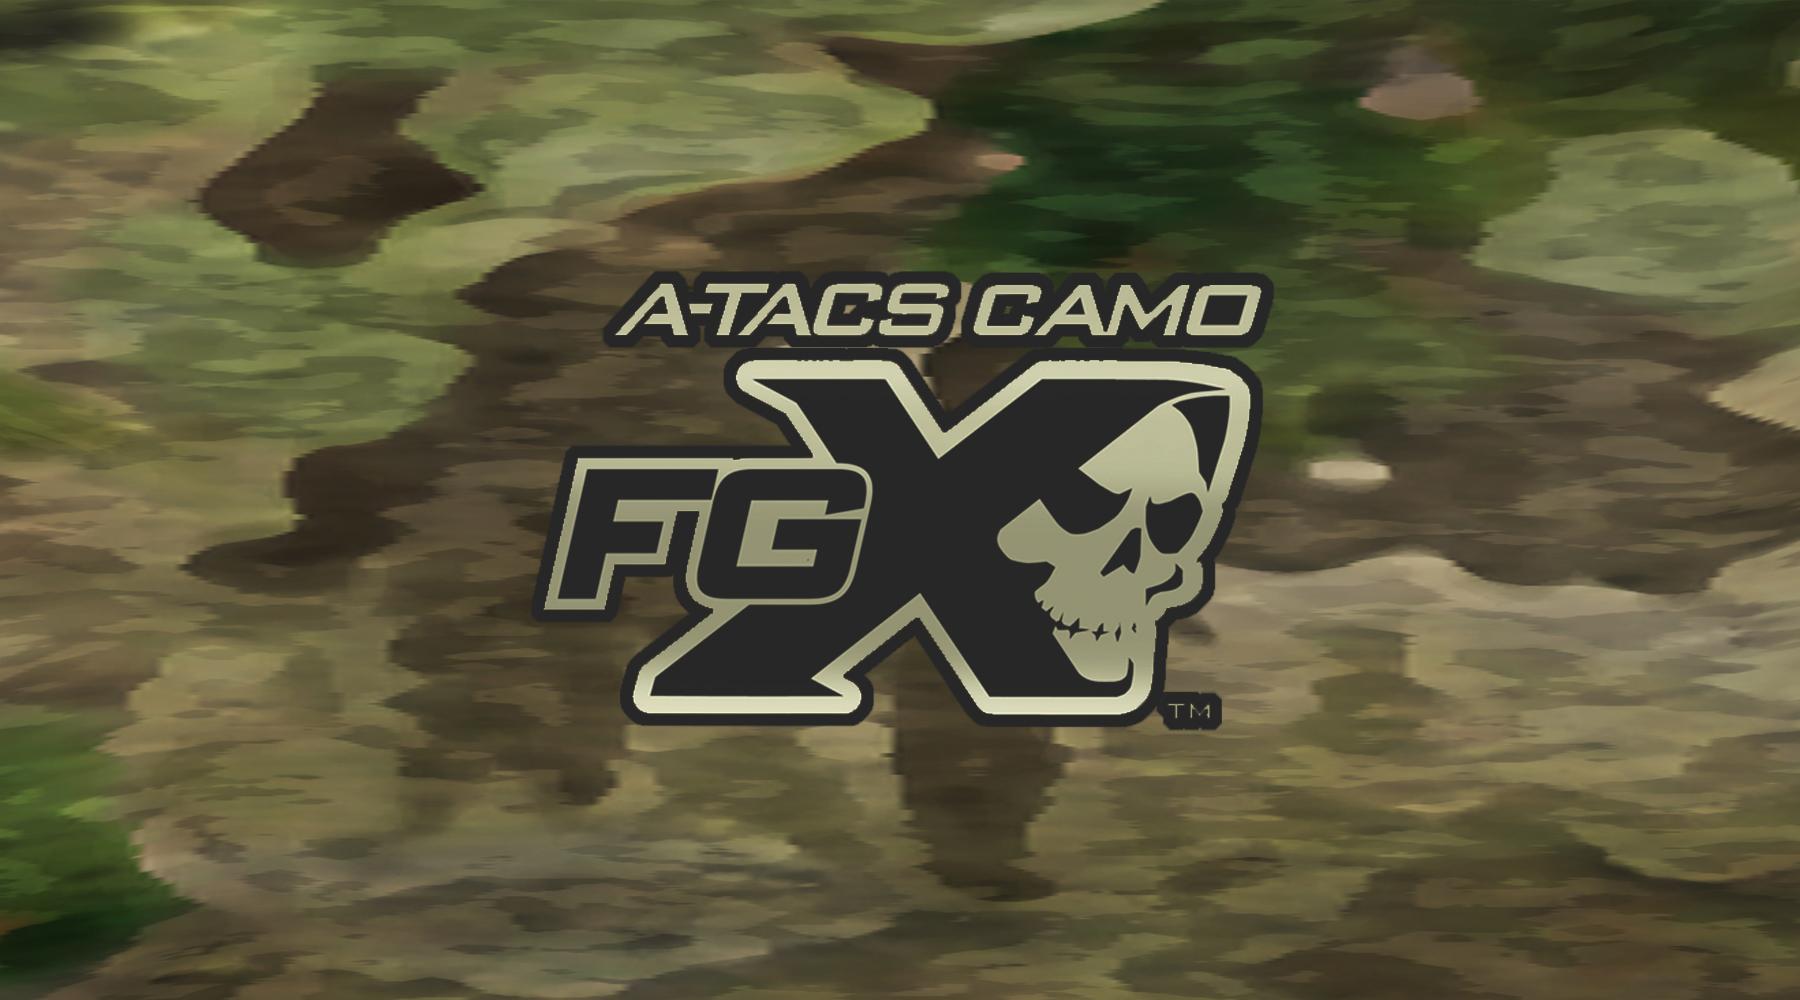 atacs_fg_x